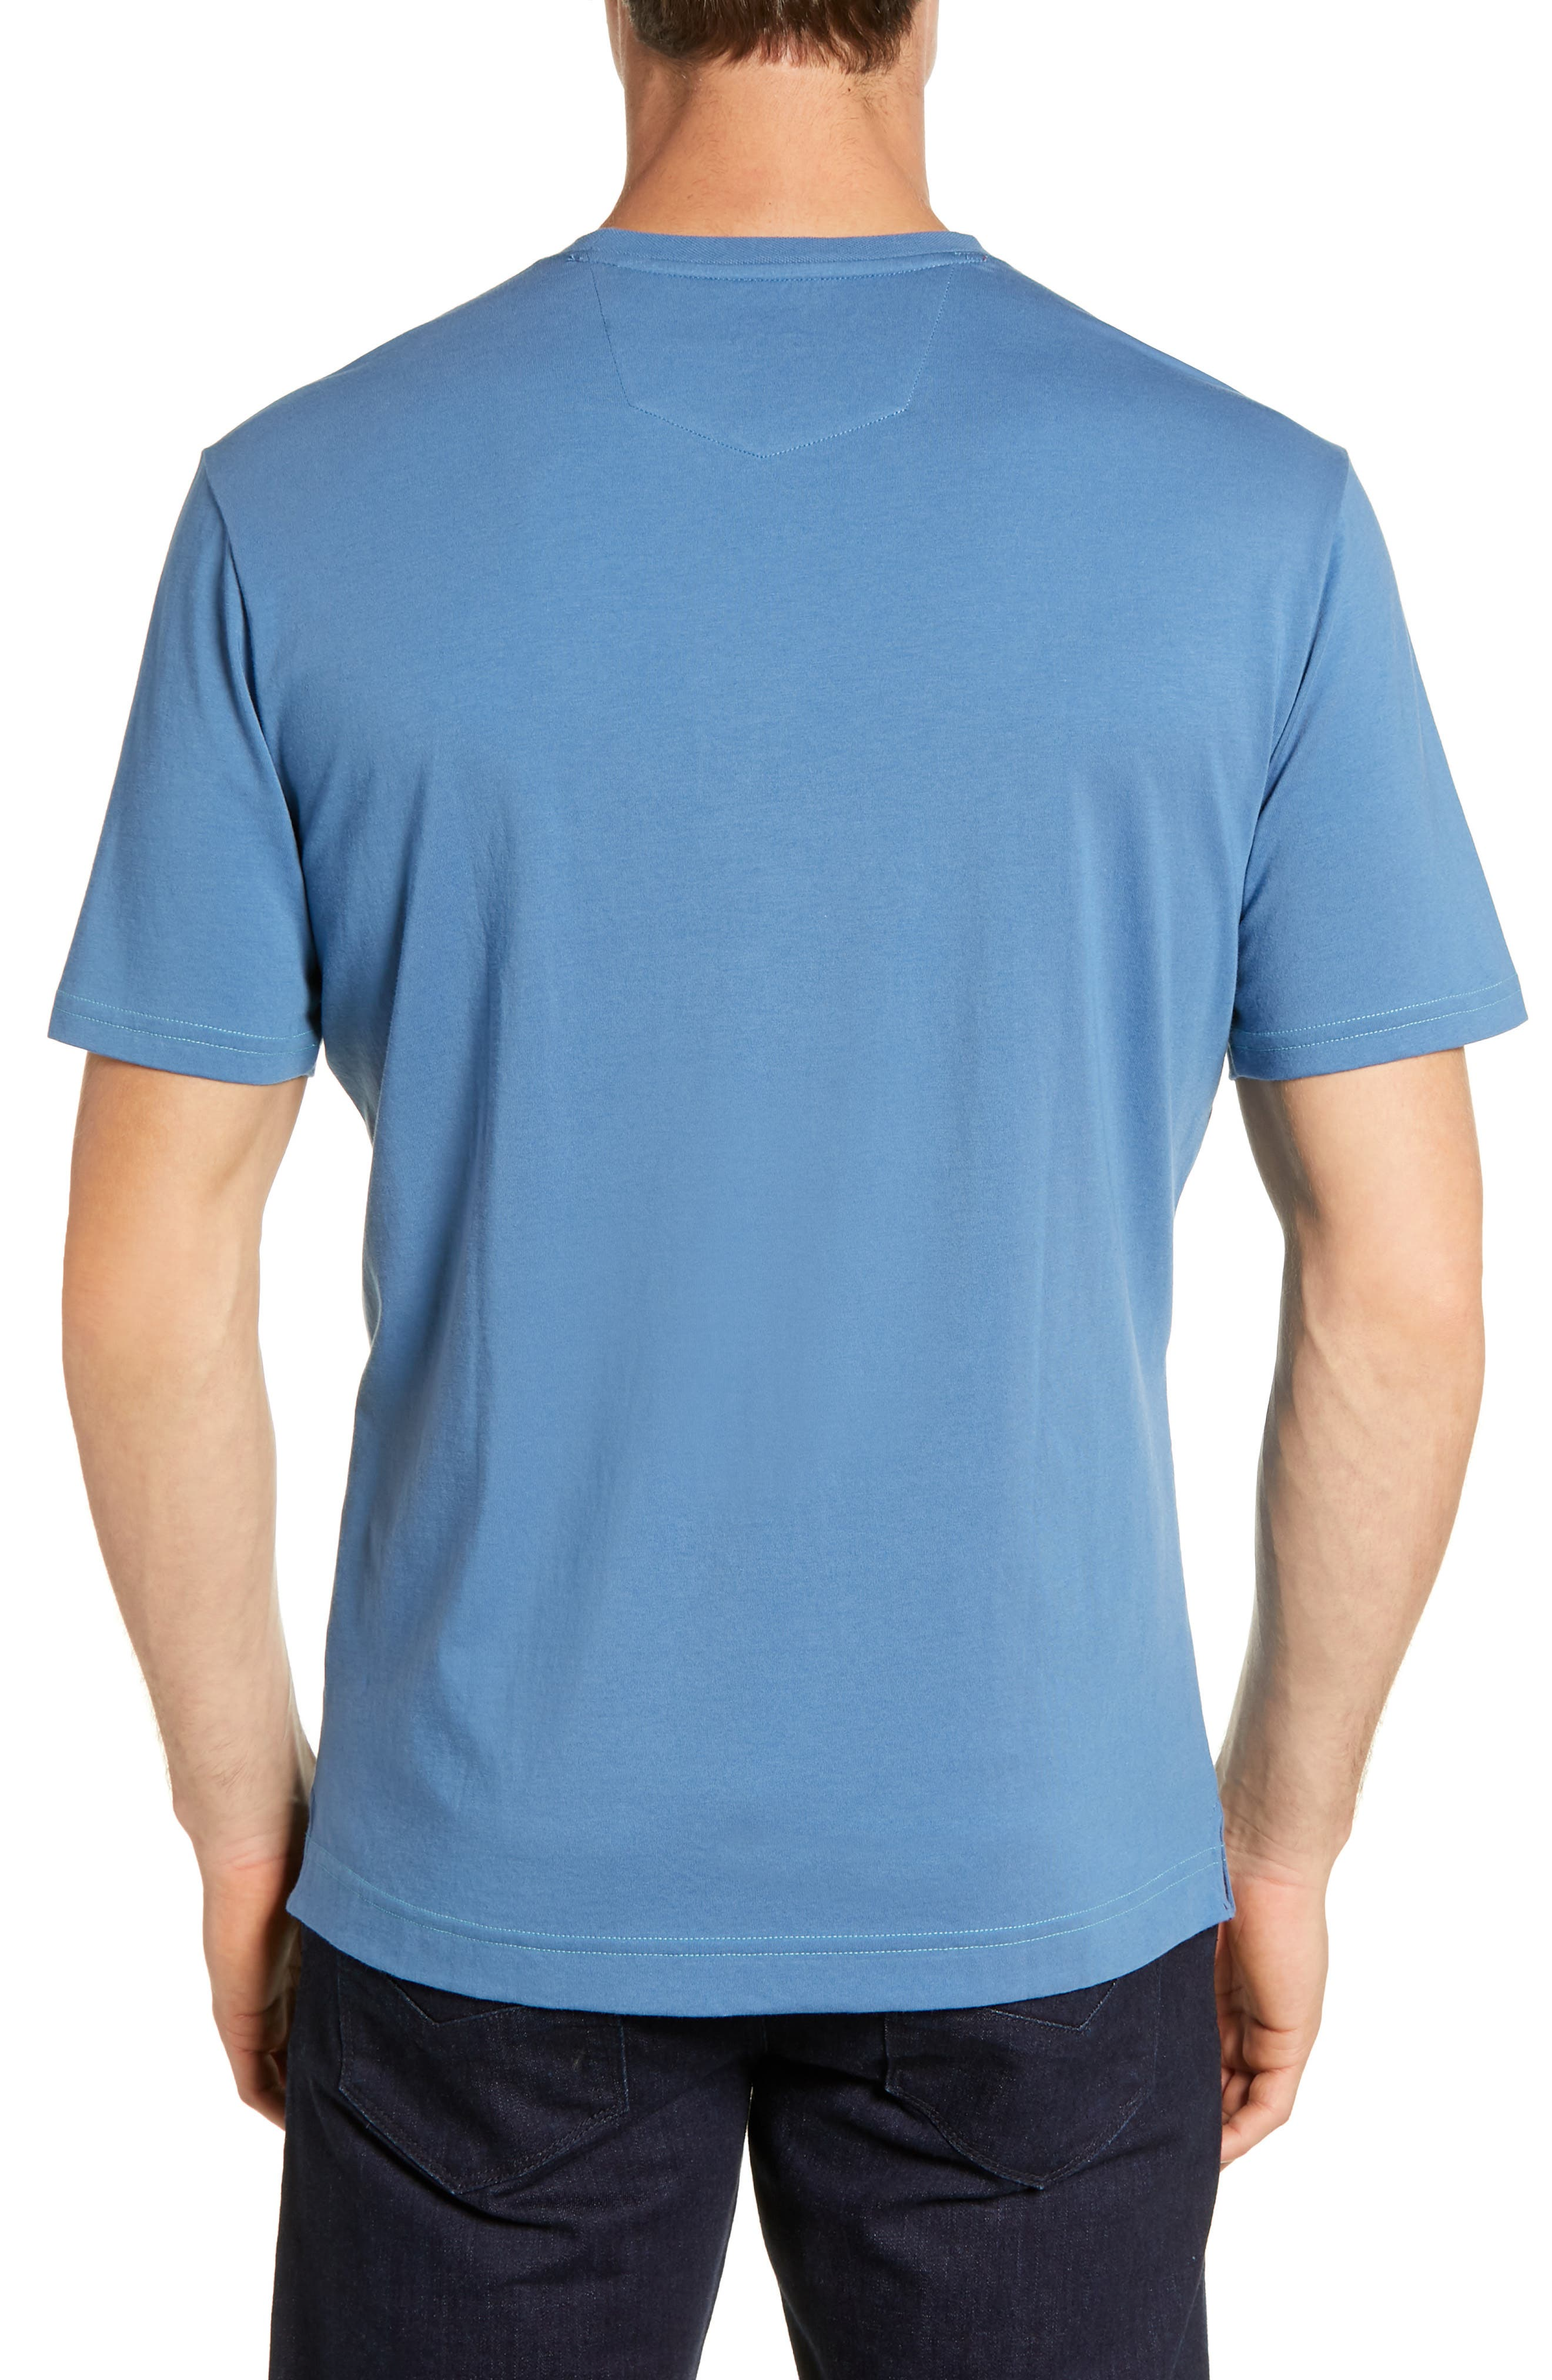 Neo T-Shirt,                             Alternate thumbnail 2, color,                             MARINE